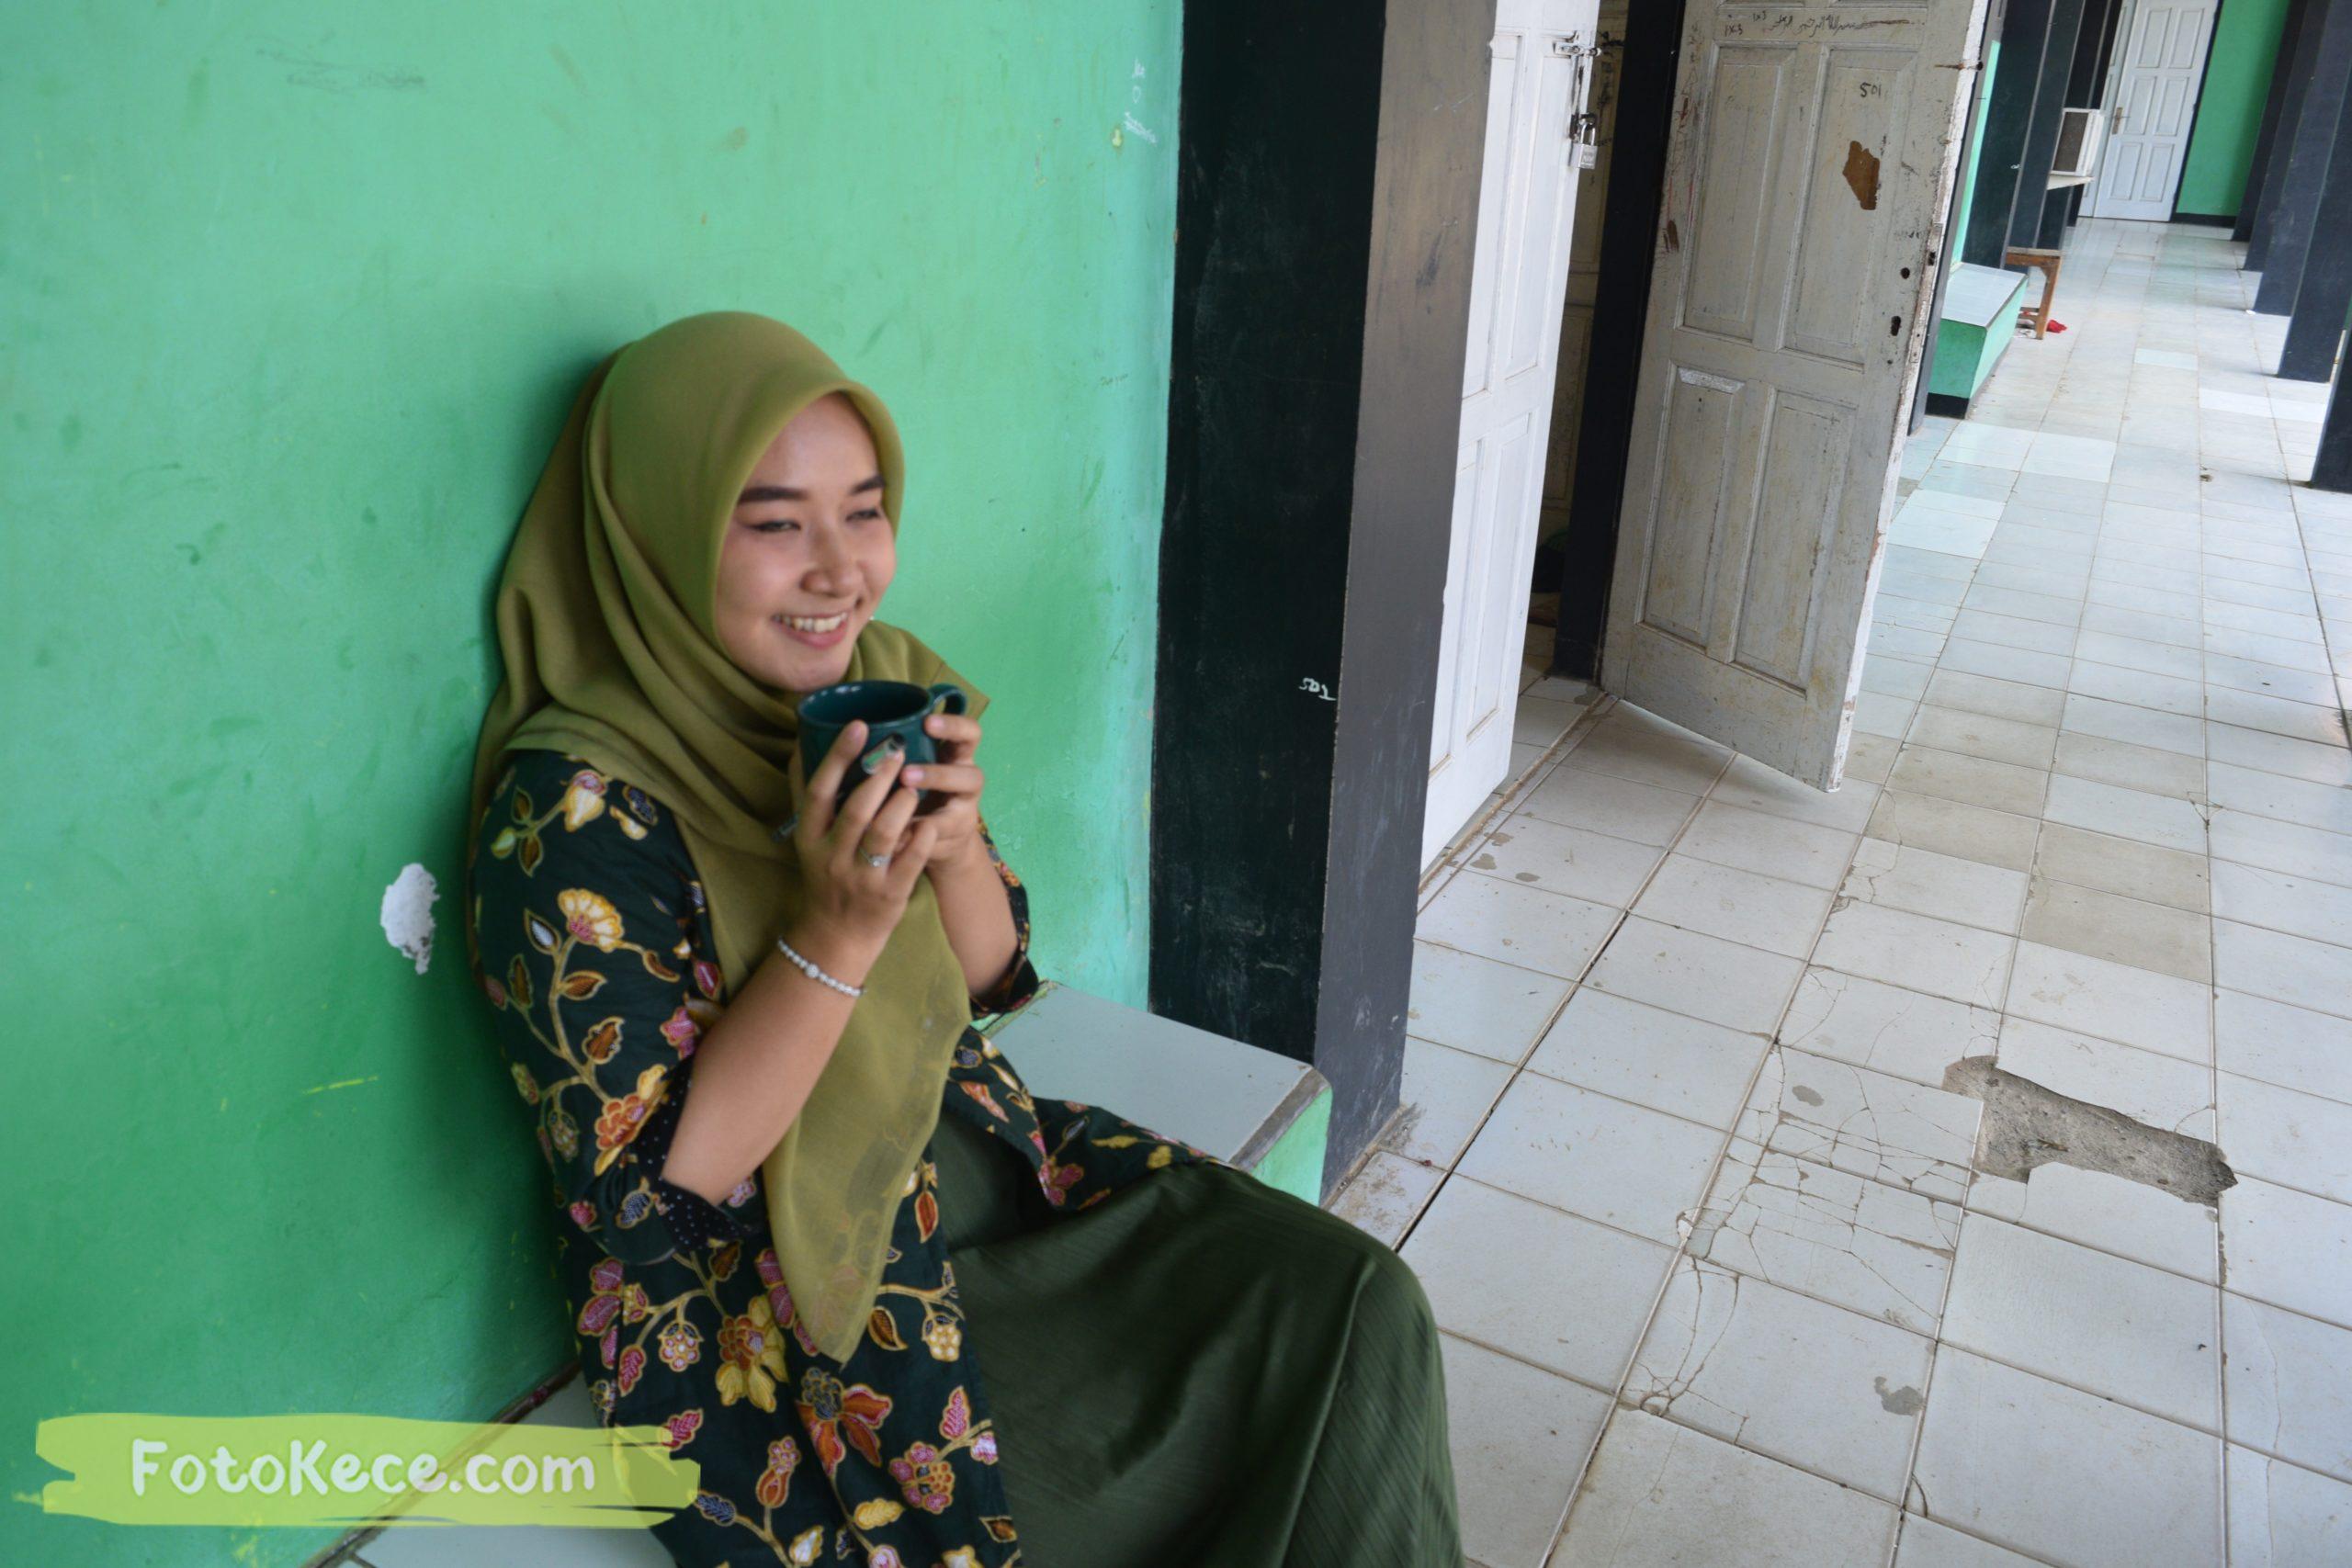 SUZANA DWI NURFAJRIEN santai pada mtsn2 smi fotokece des 2019 24 scaled